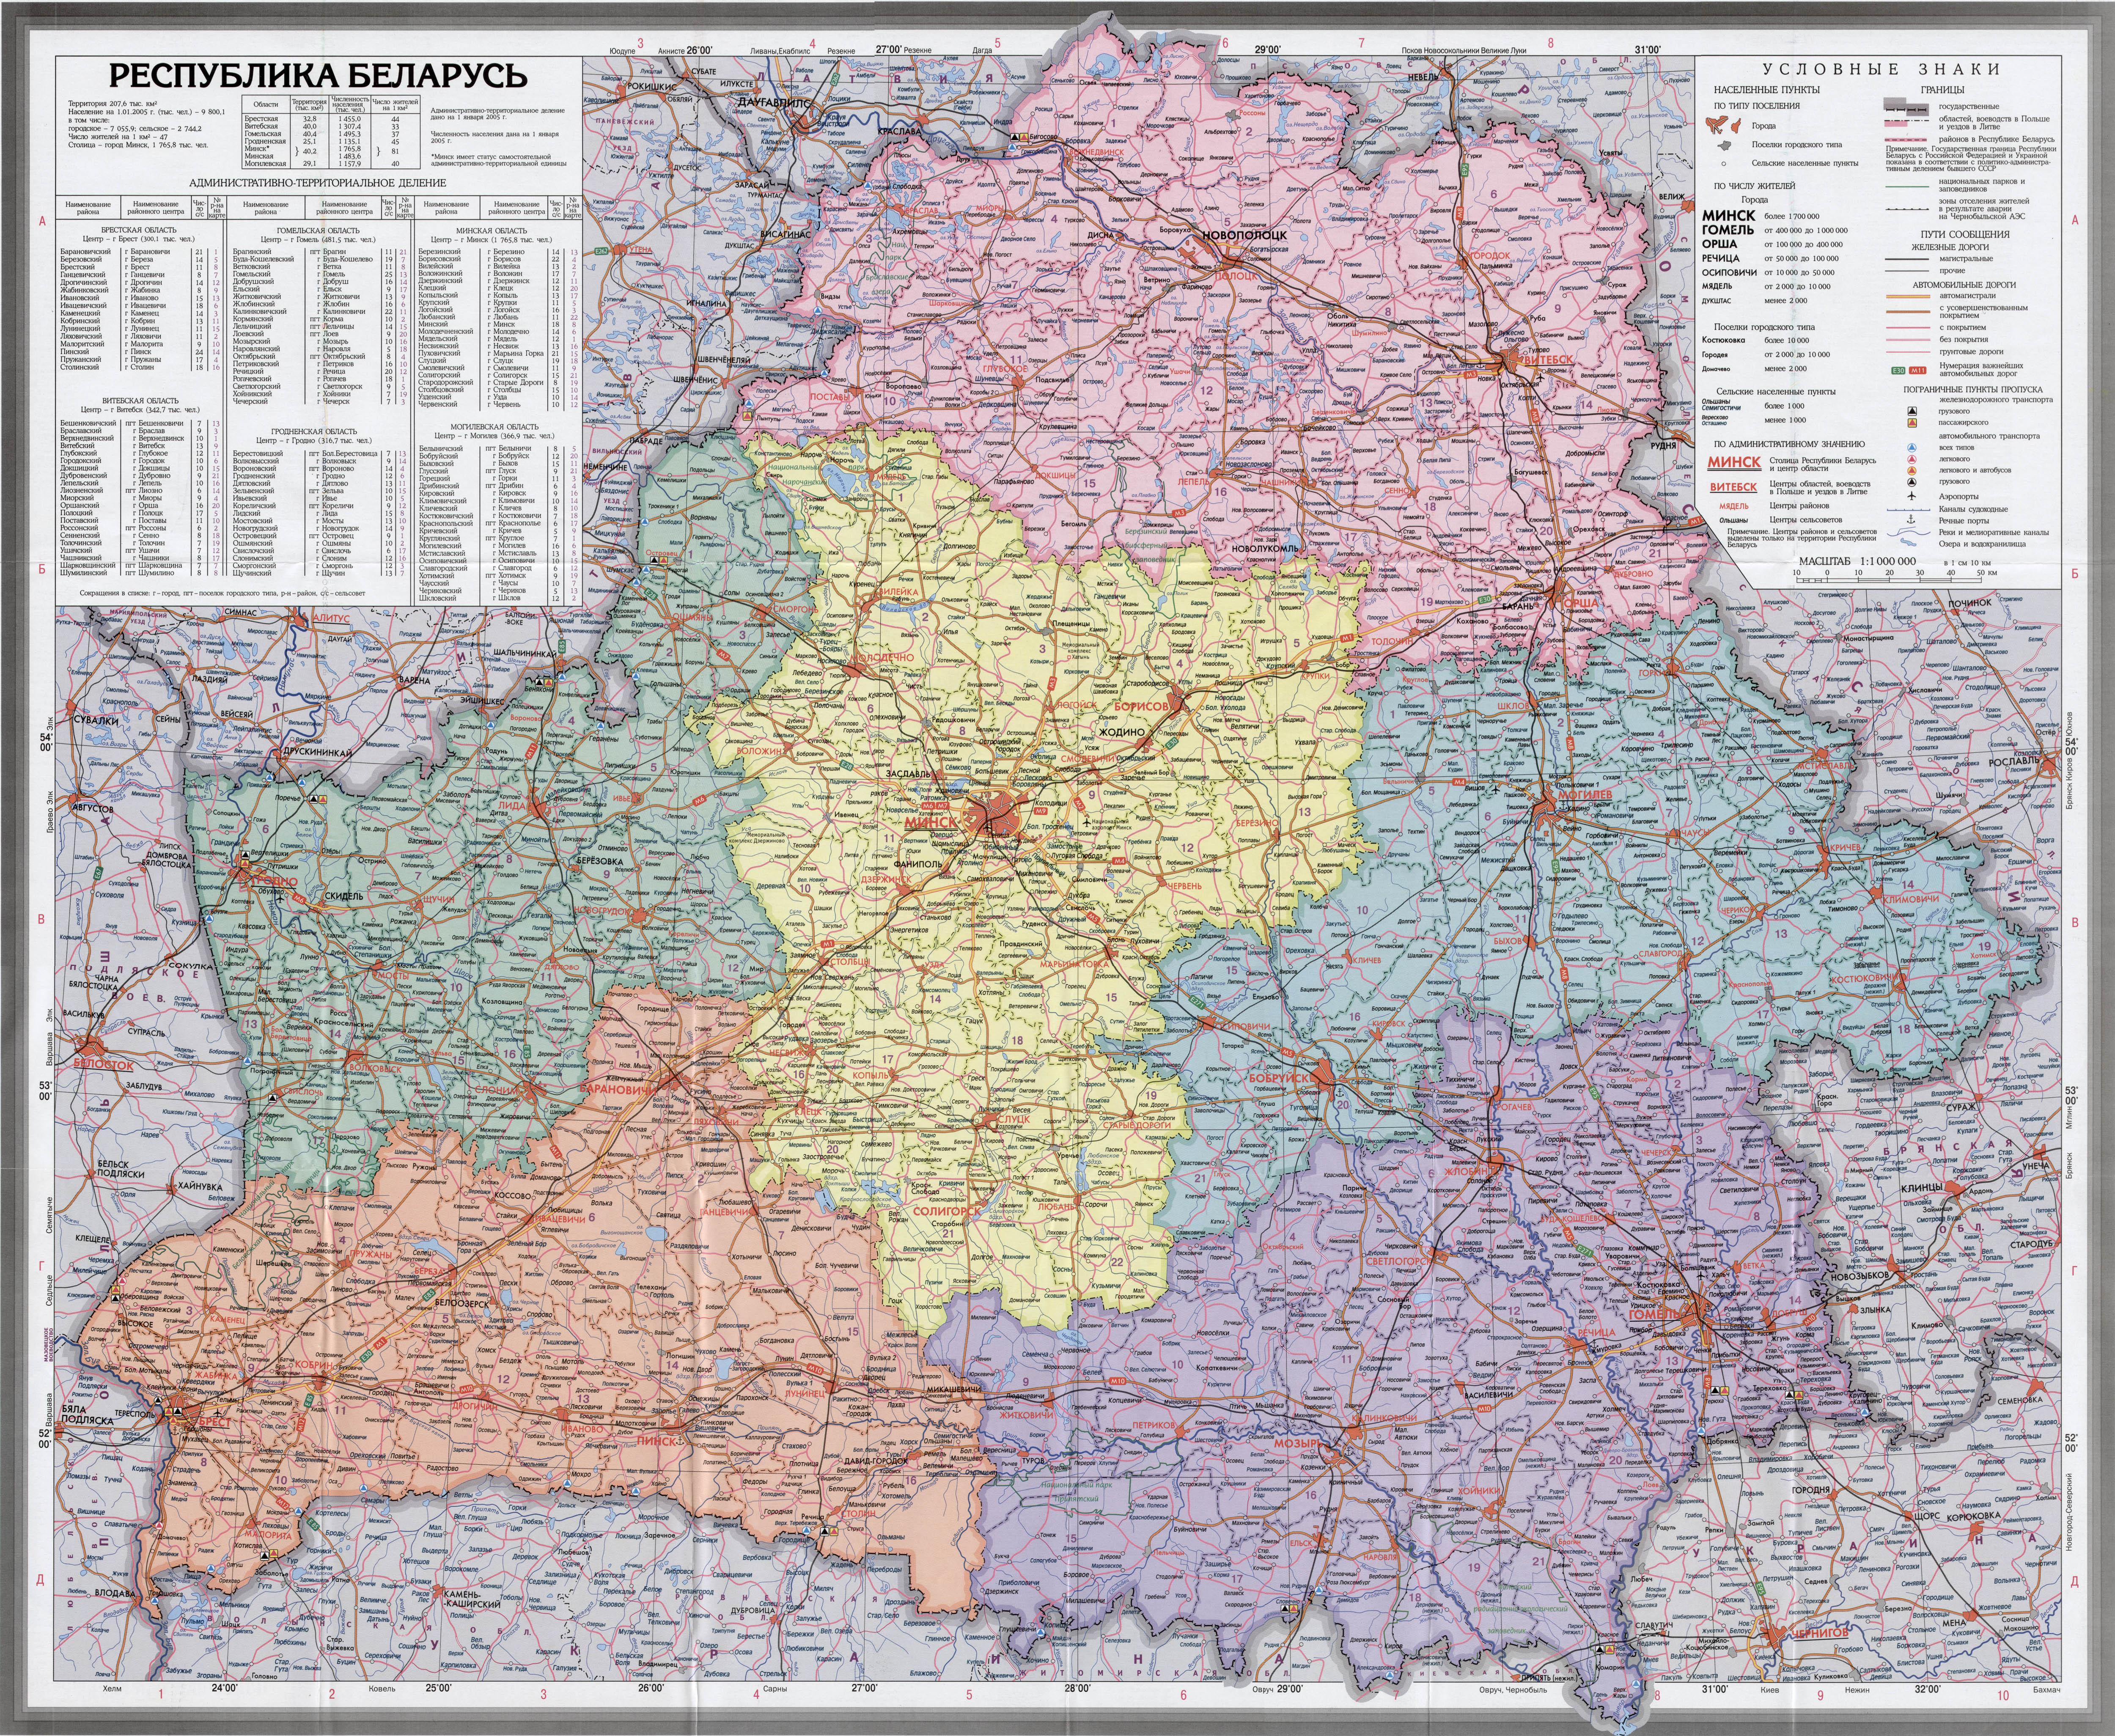 Карта-панорама беларуси. Отдых в беларуси. Туристическая карта.